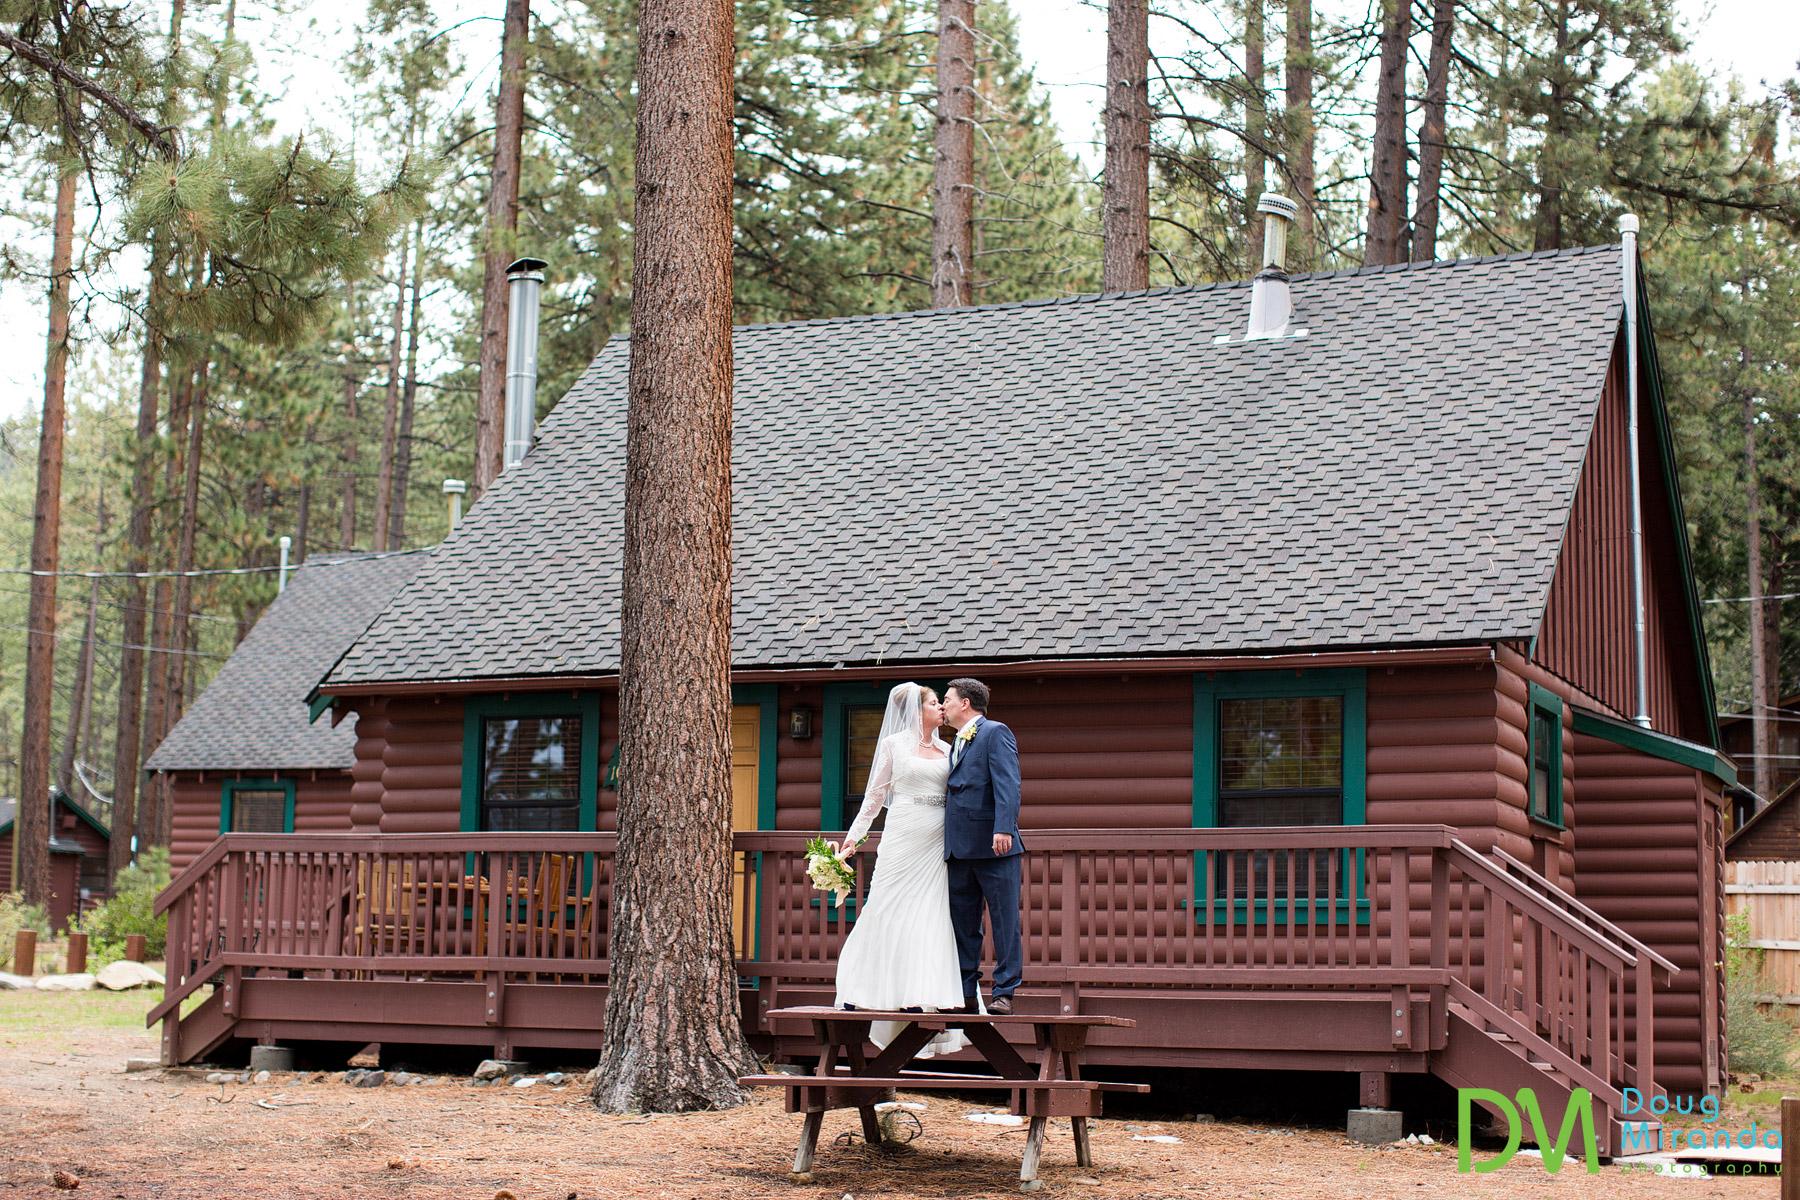 zephyr cove resort cabin photos